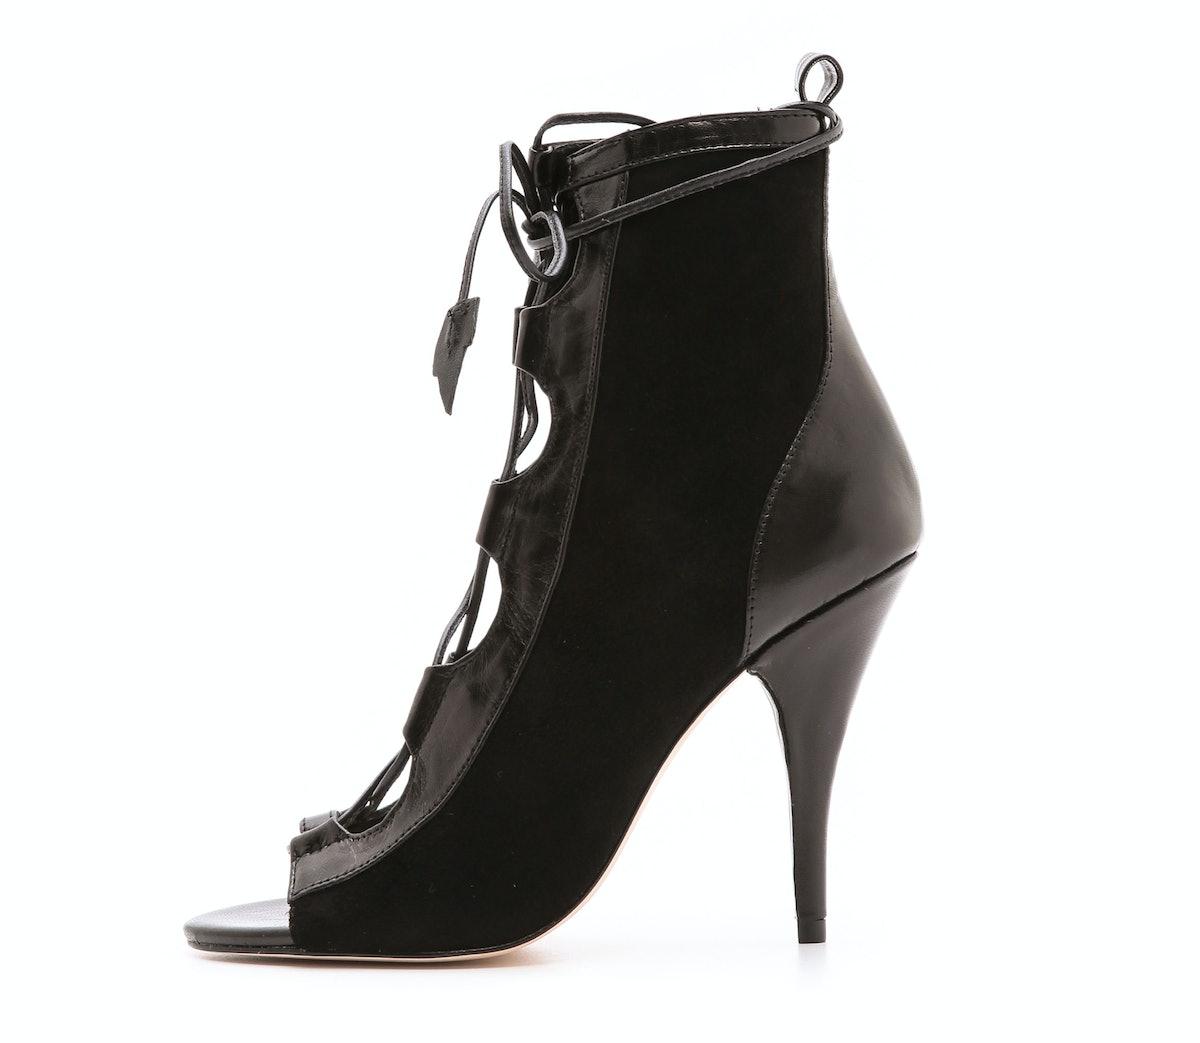 fass-open-toe-booties-10-isa-tapia